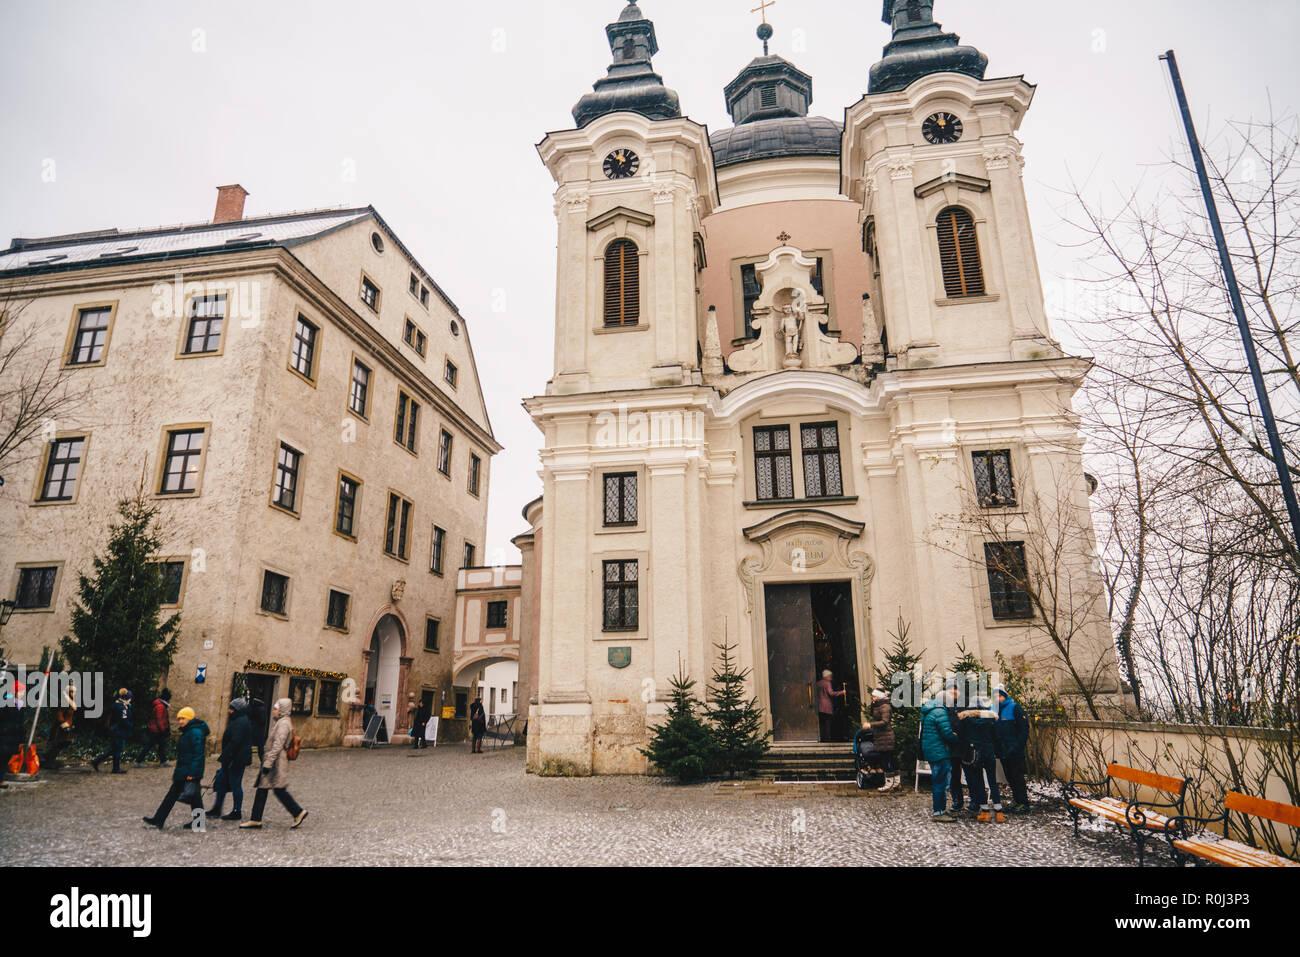 Pfarramt Christkindl Cathloic Church in Steyr Austria near the Christmas Postoffice - Stock Image